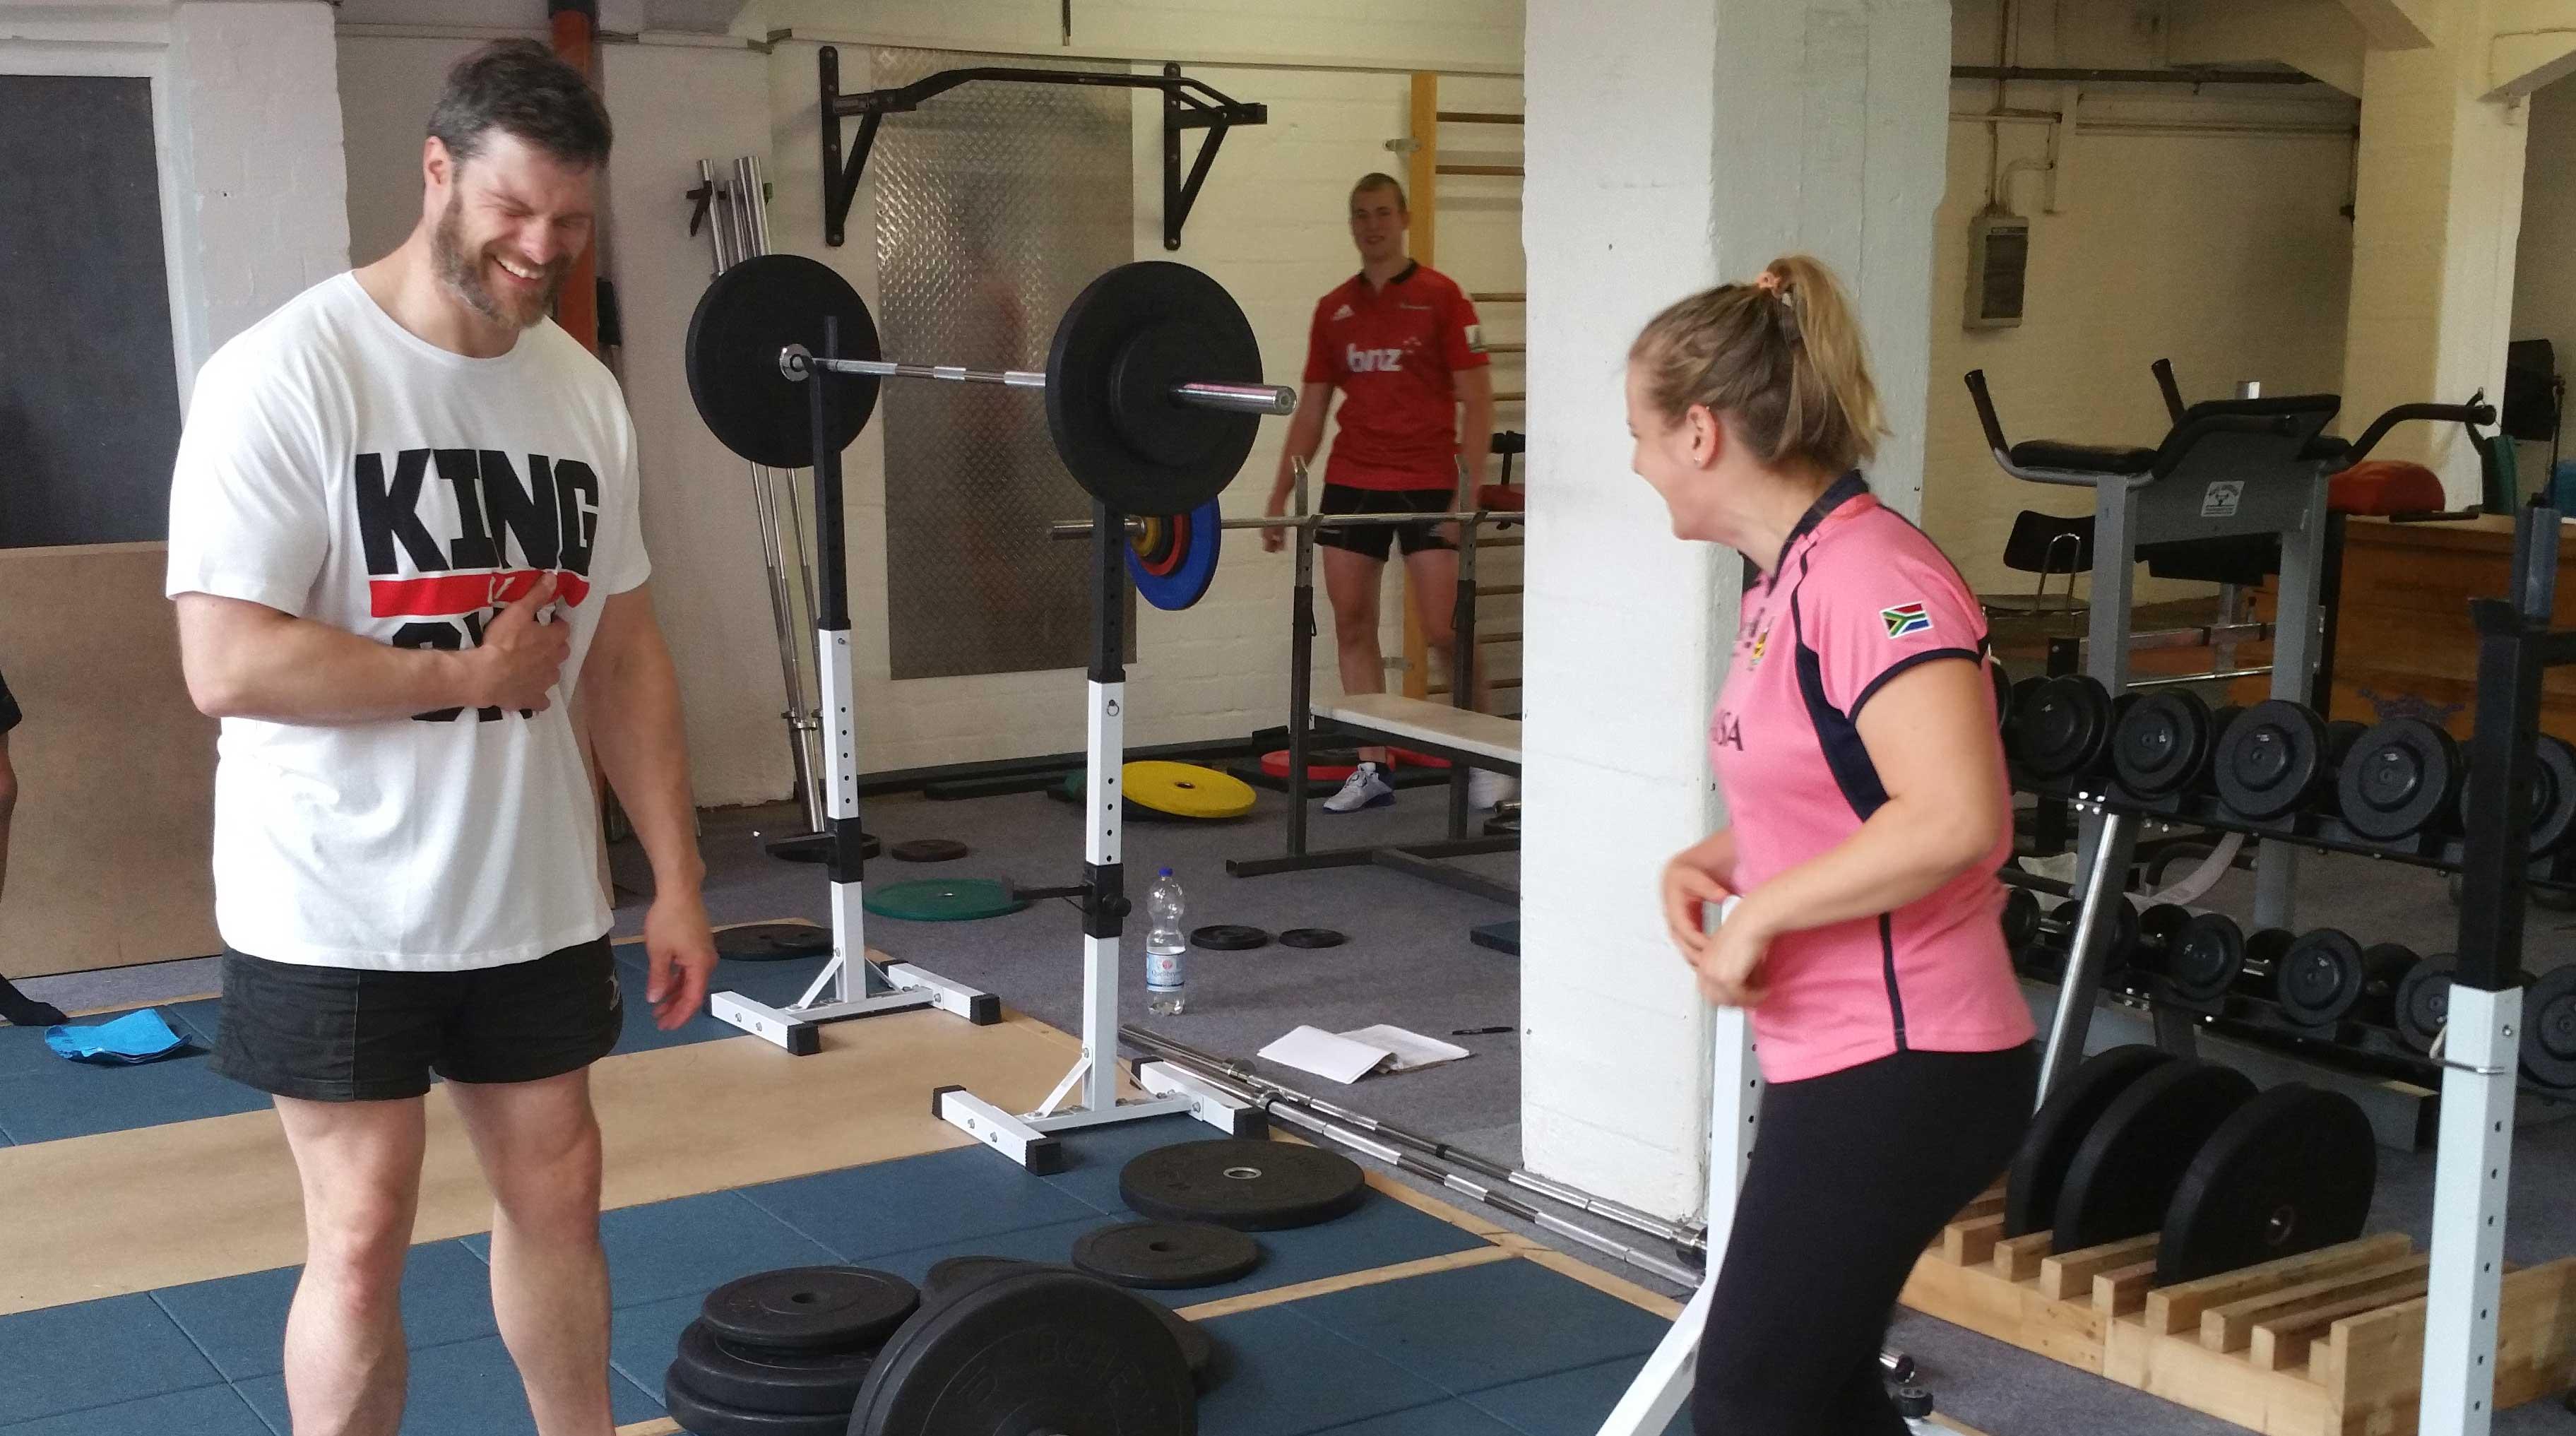 Mark-und-Jessy-Personal-Training-JPG